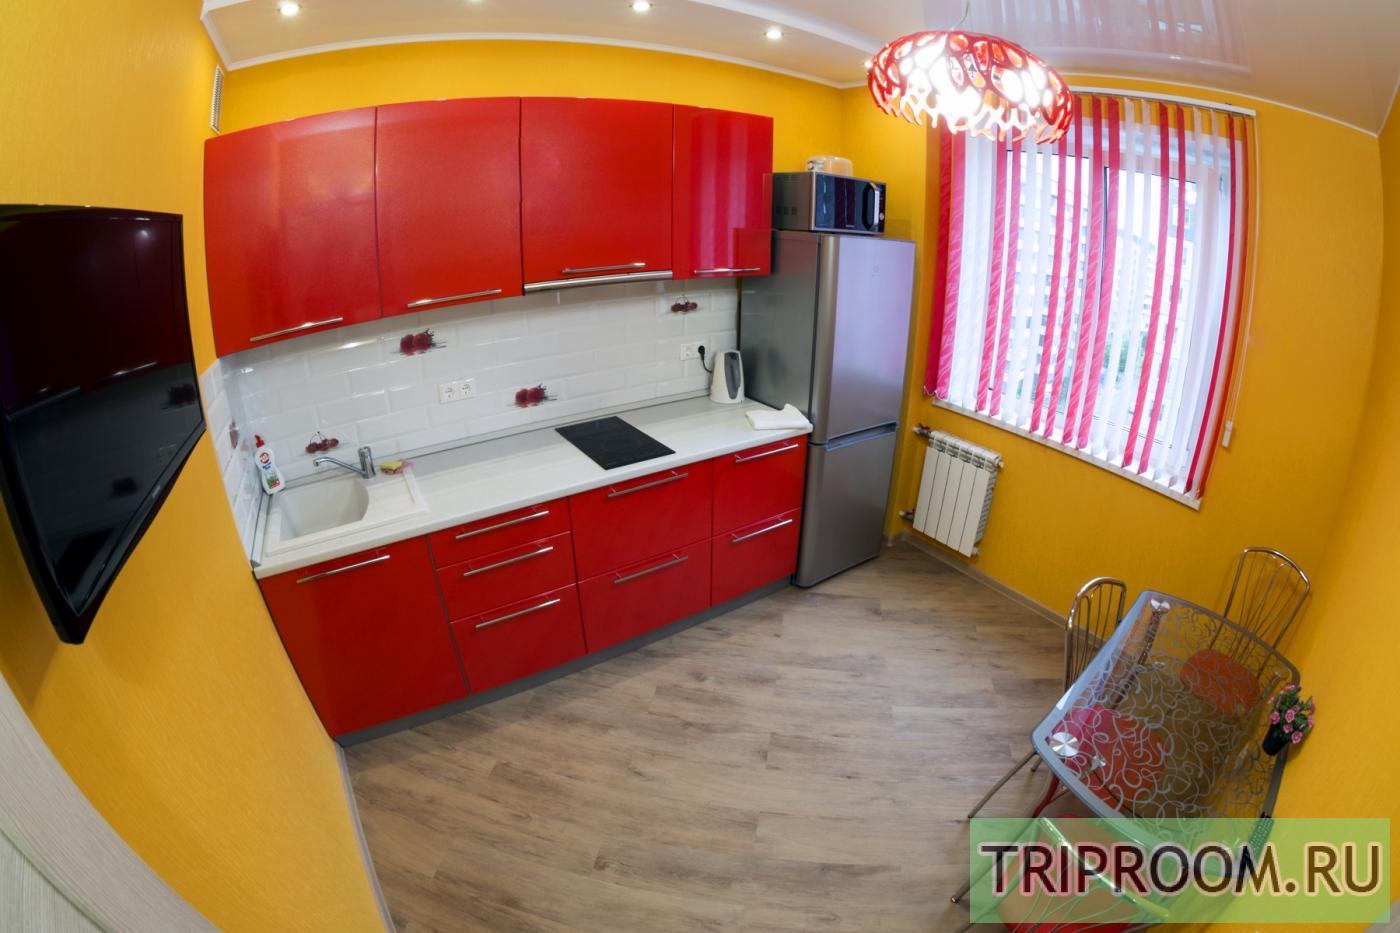 1-комнатная квартира посуточно (вариант № 20514), ул. Водопьянова улица, фото № 4